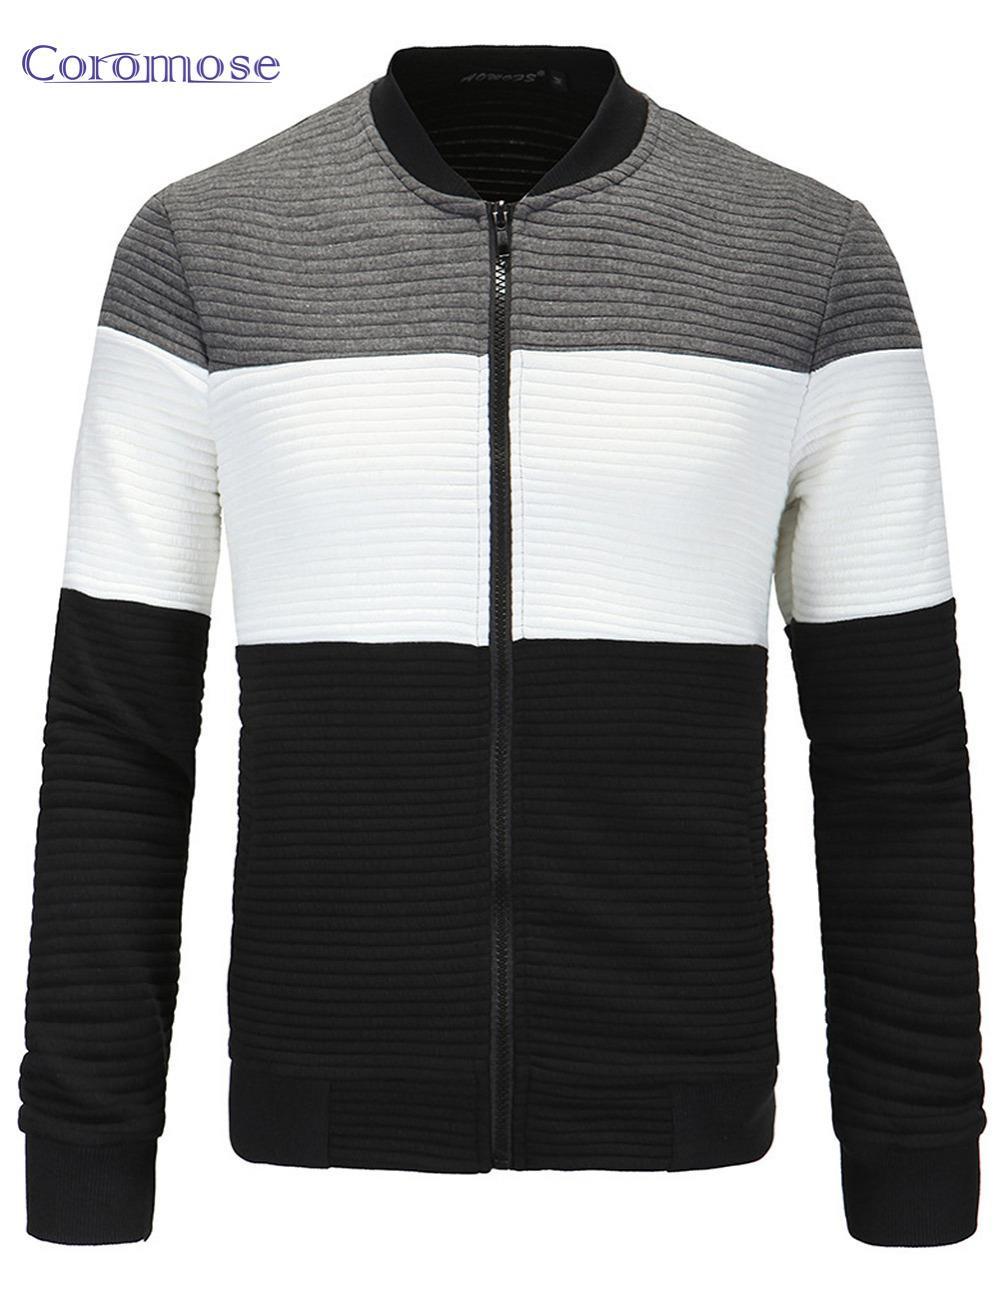 Wholesale- Coromose Men Jacket 2017 Autumn Spring Brand Clothing ... c505ea82c